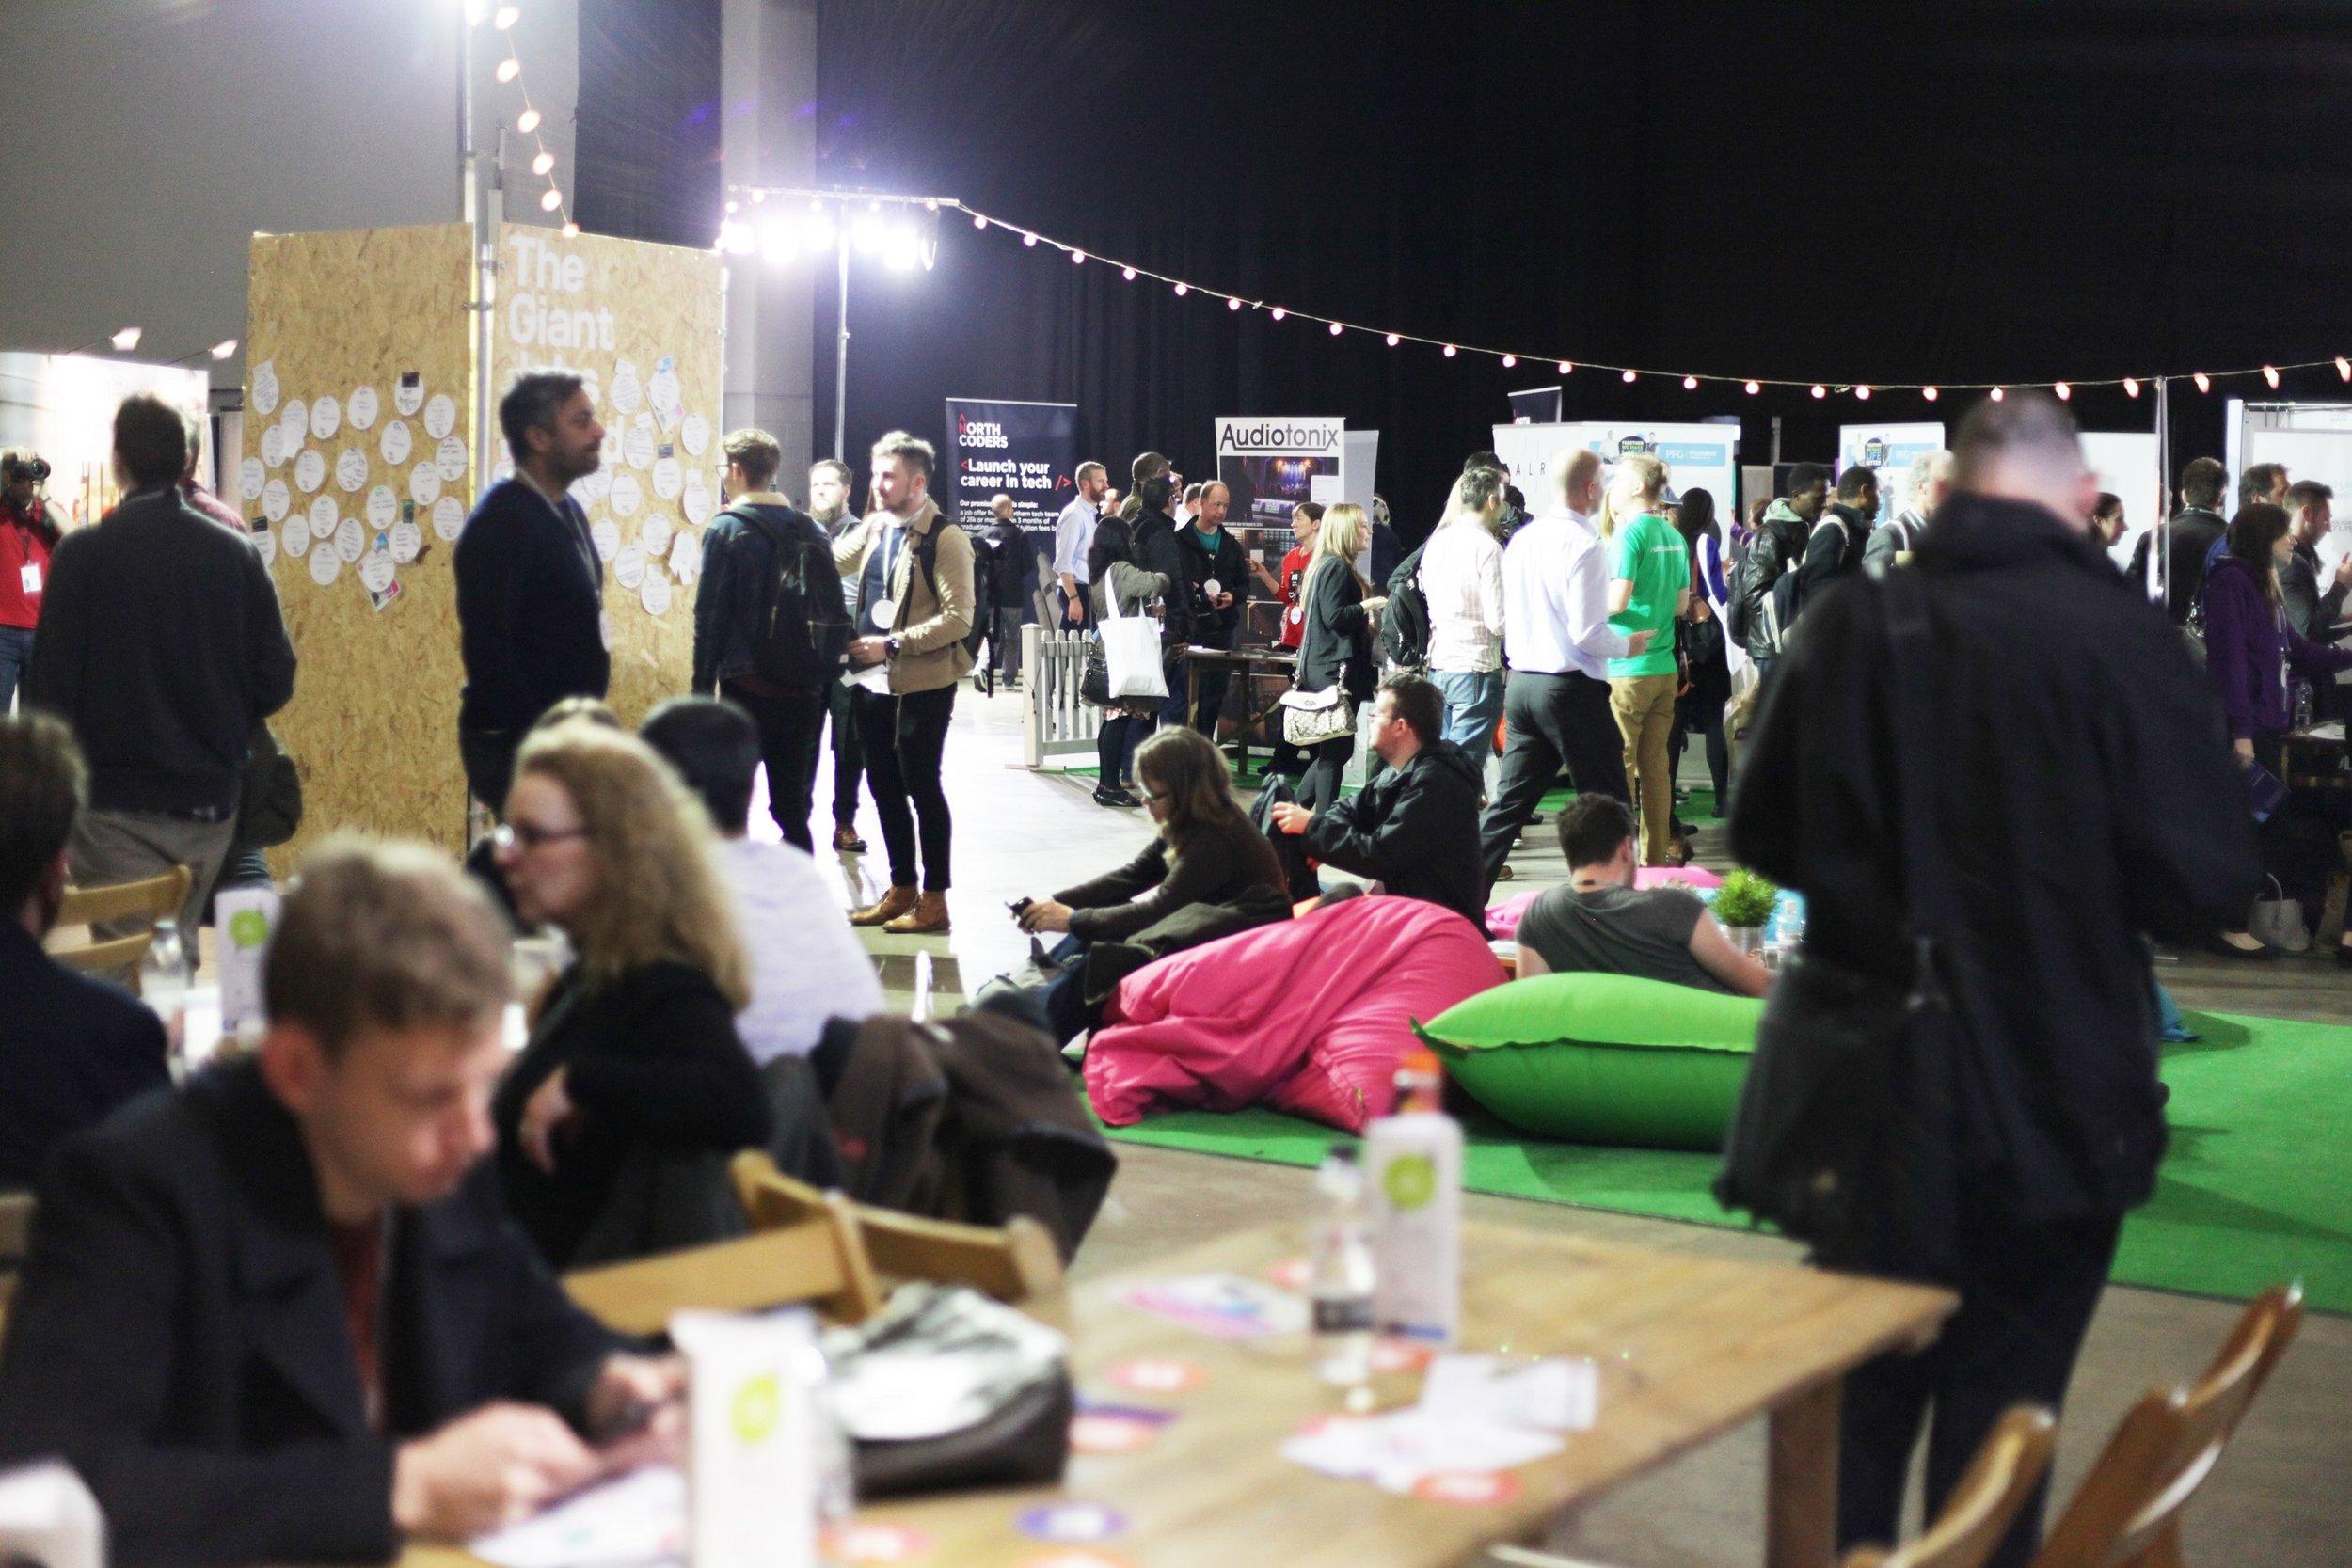 A packed First Direct Arena at Leeds Digital Job Fair 2.0